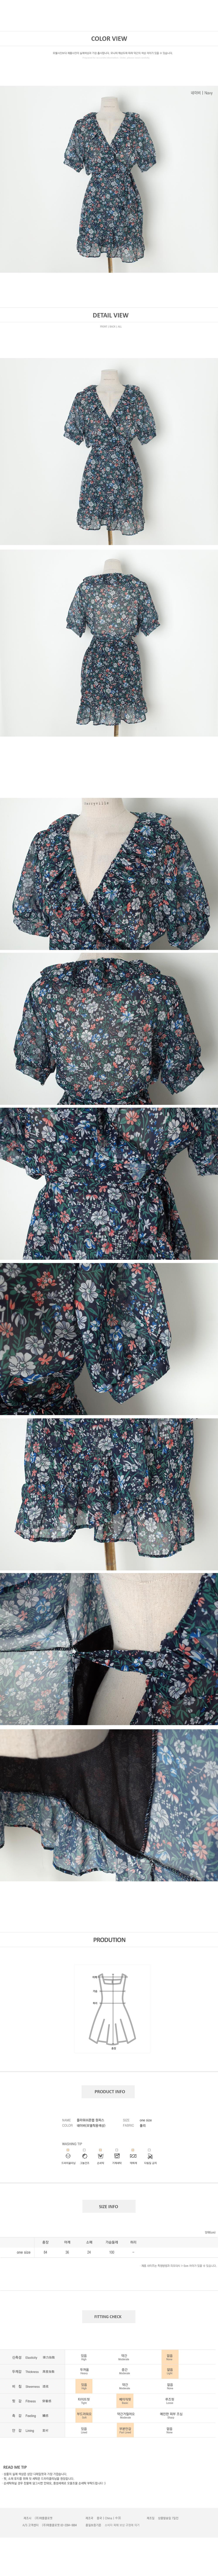 Flower chiffon wrap dress